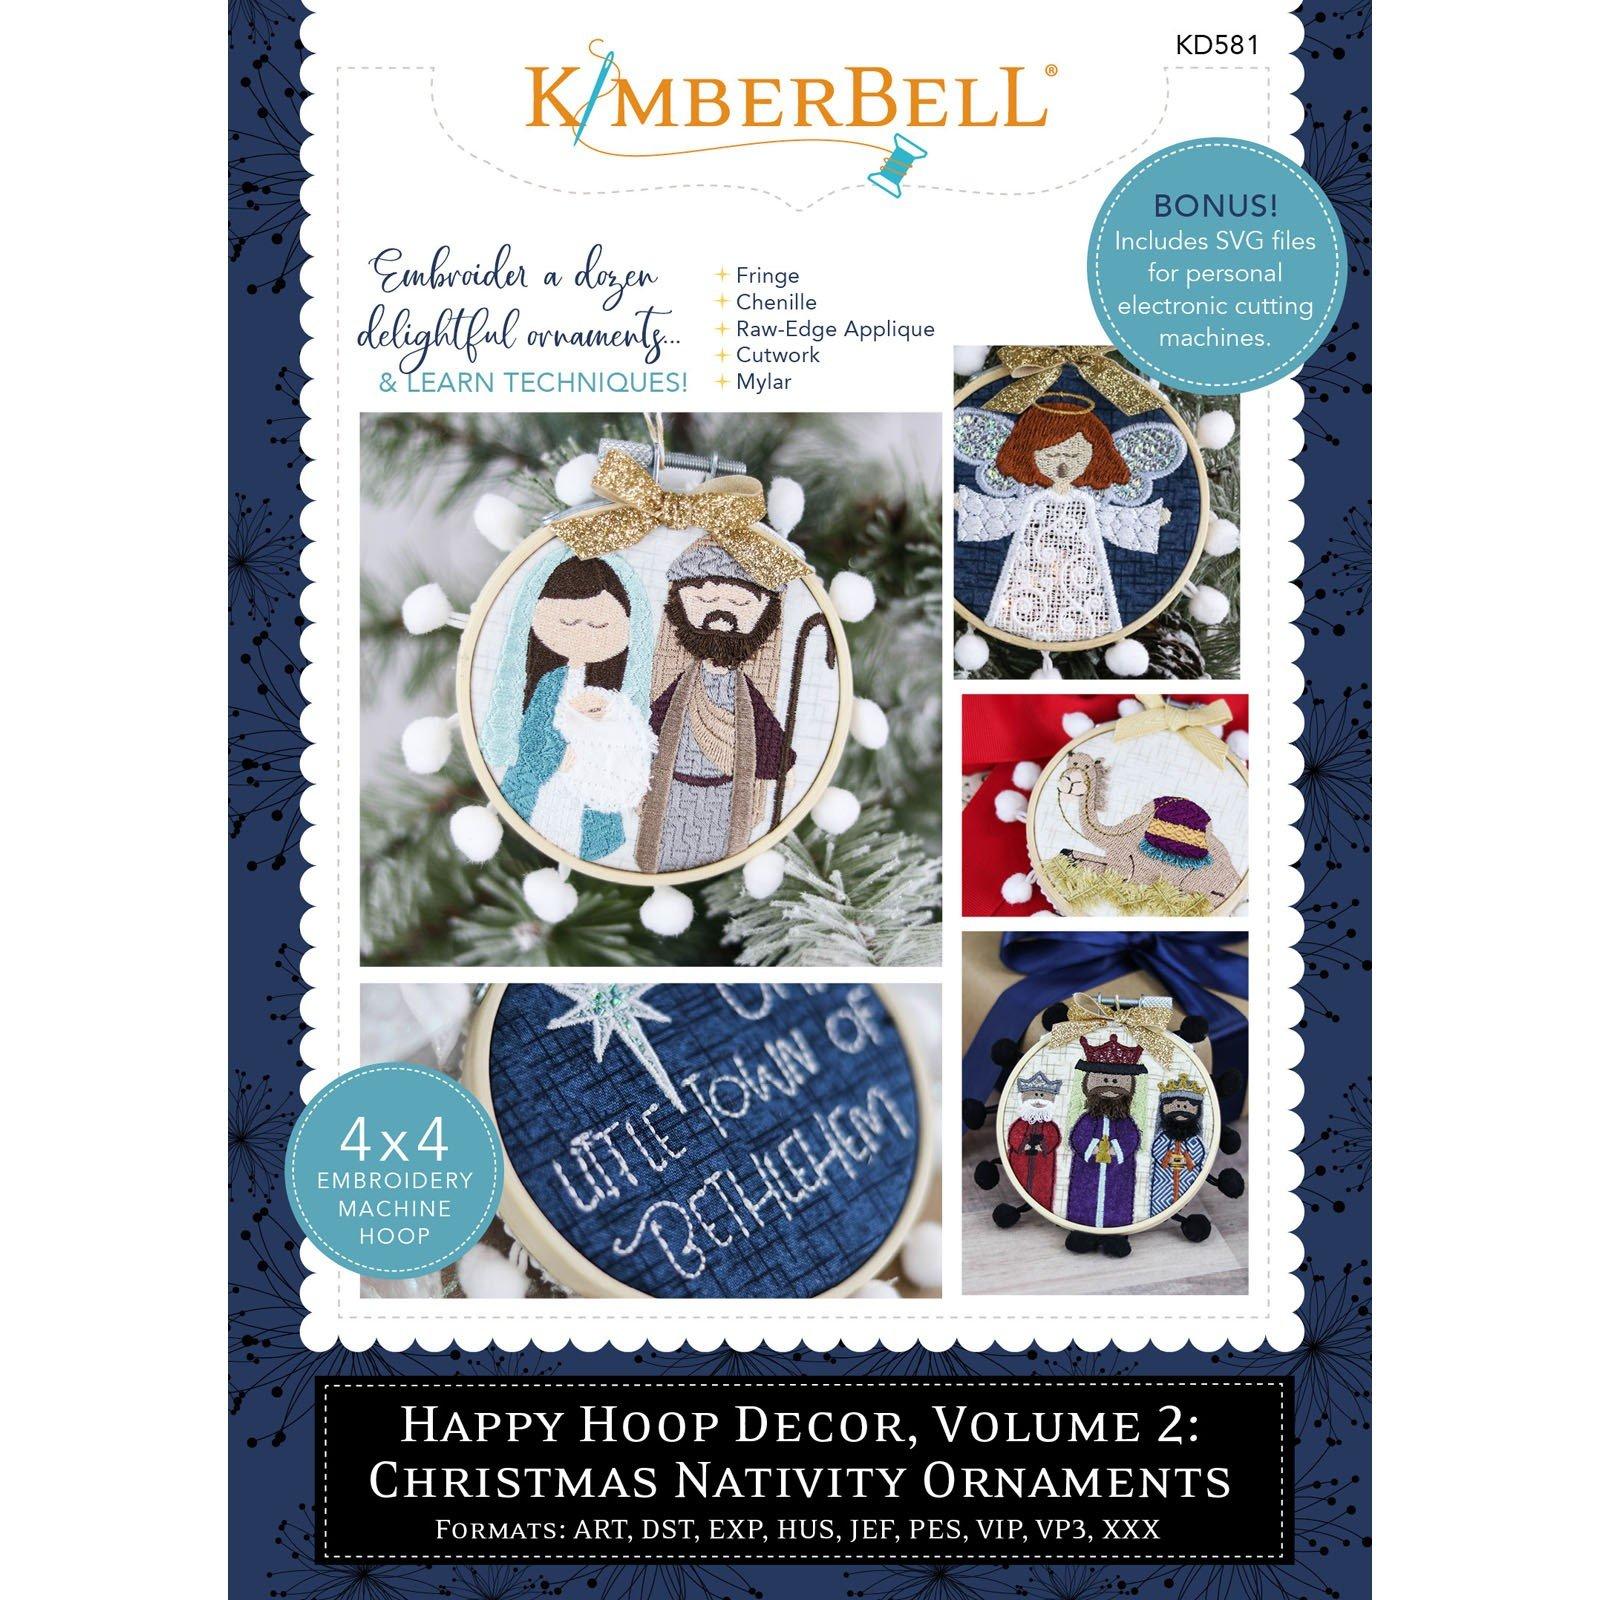 Happy Hoop Decor, Vol. 2: Christmas Nativity Ornaments (Embroidery CD) by Kimberbell